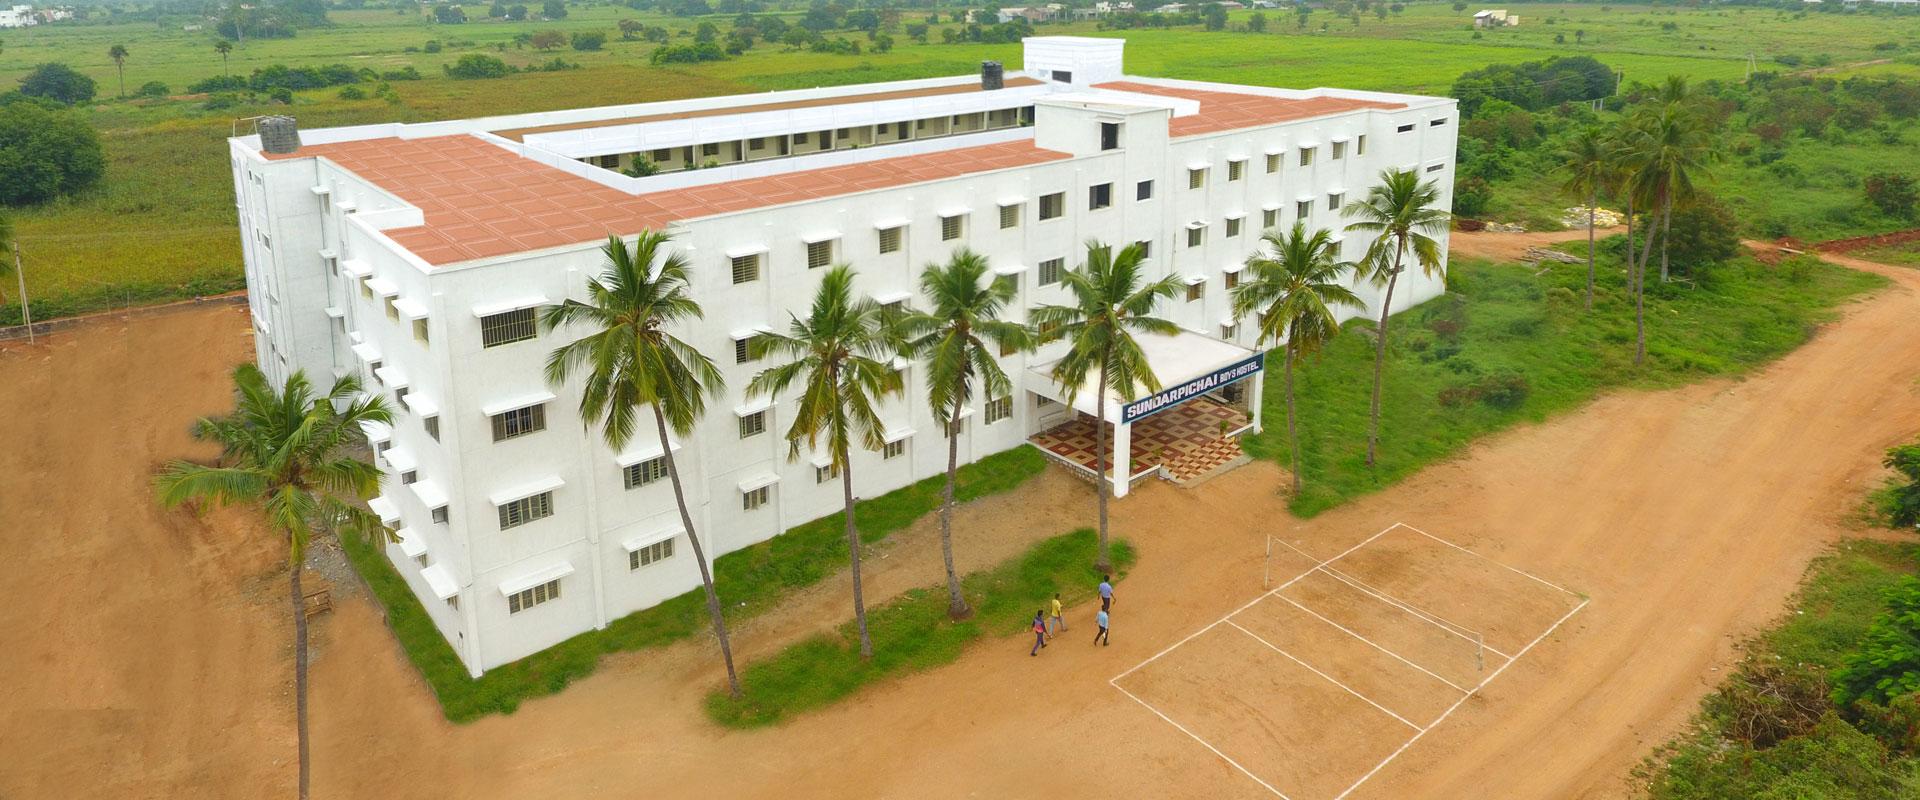 SP-Hostel